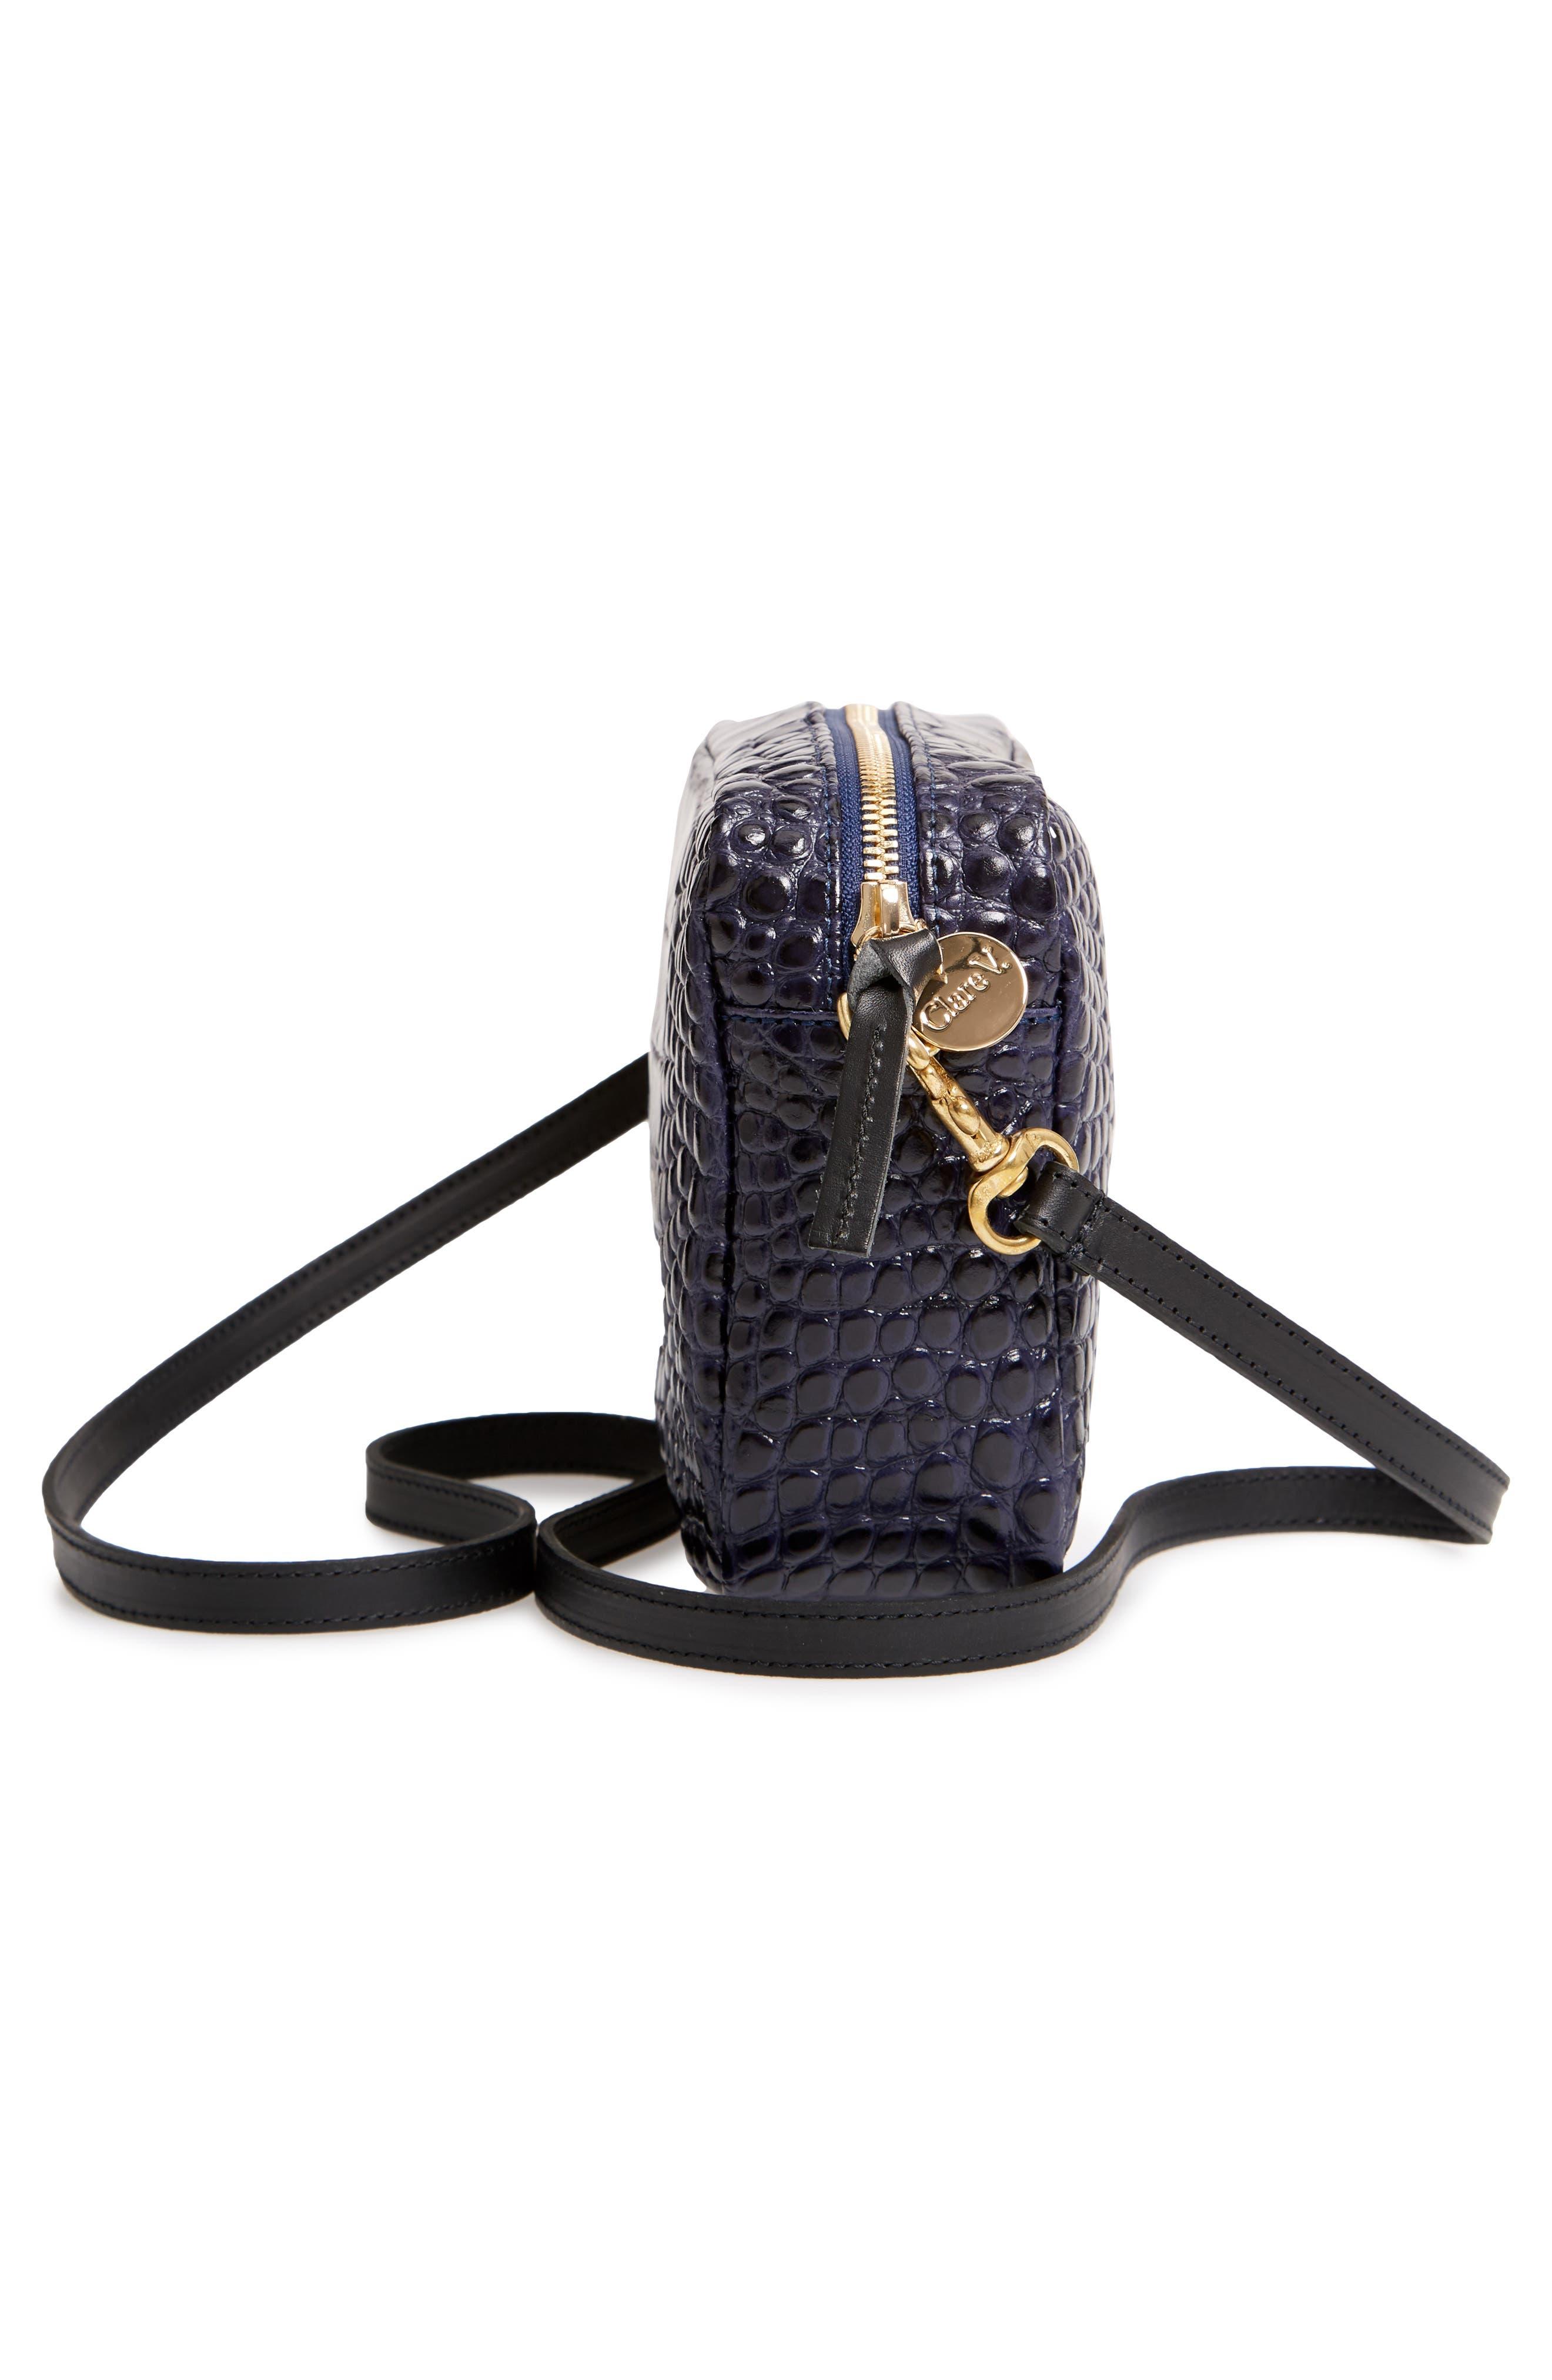 Midi Sac Croc Embossed Leather Crossbody Bag,                             Alternate thumbnail 5, color,                             MIDNIGHT CROCO